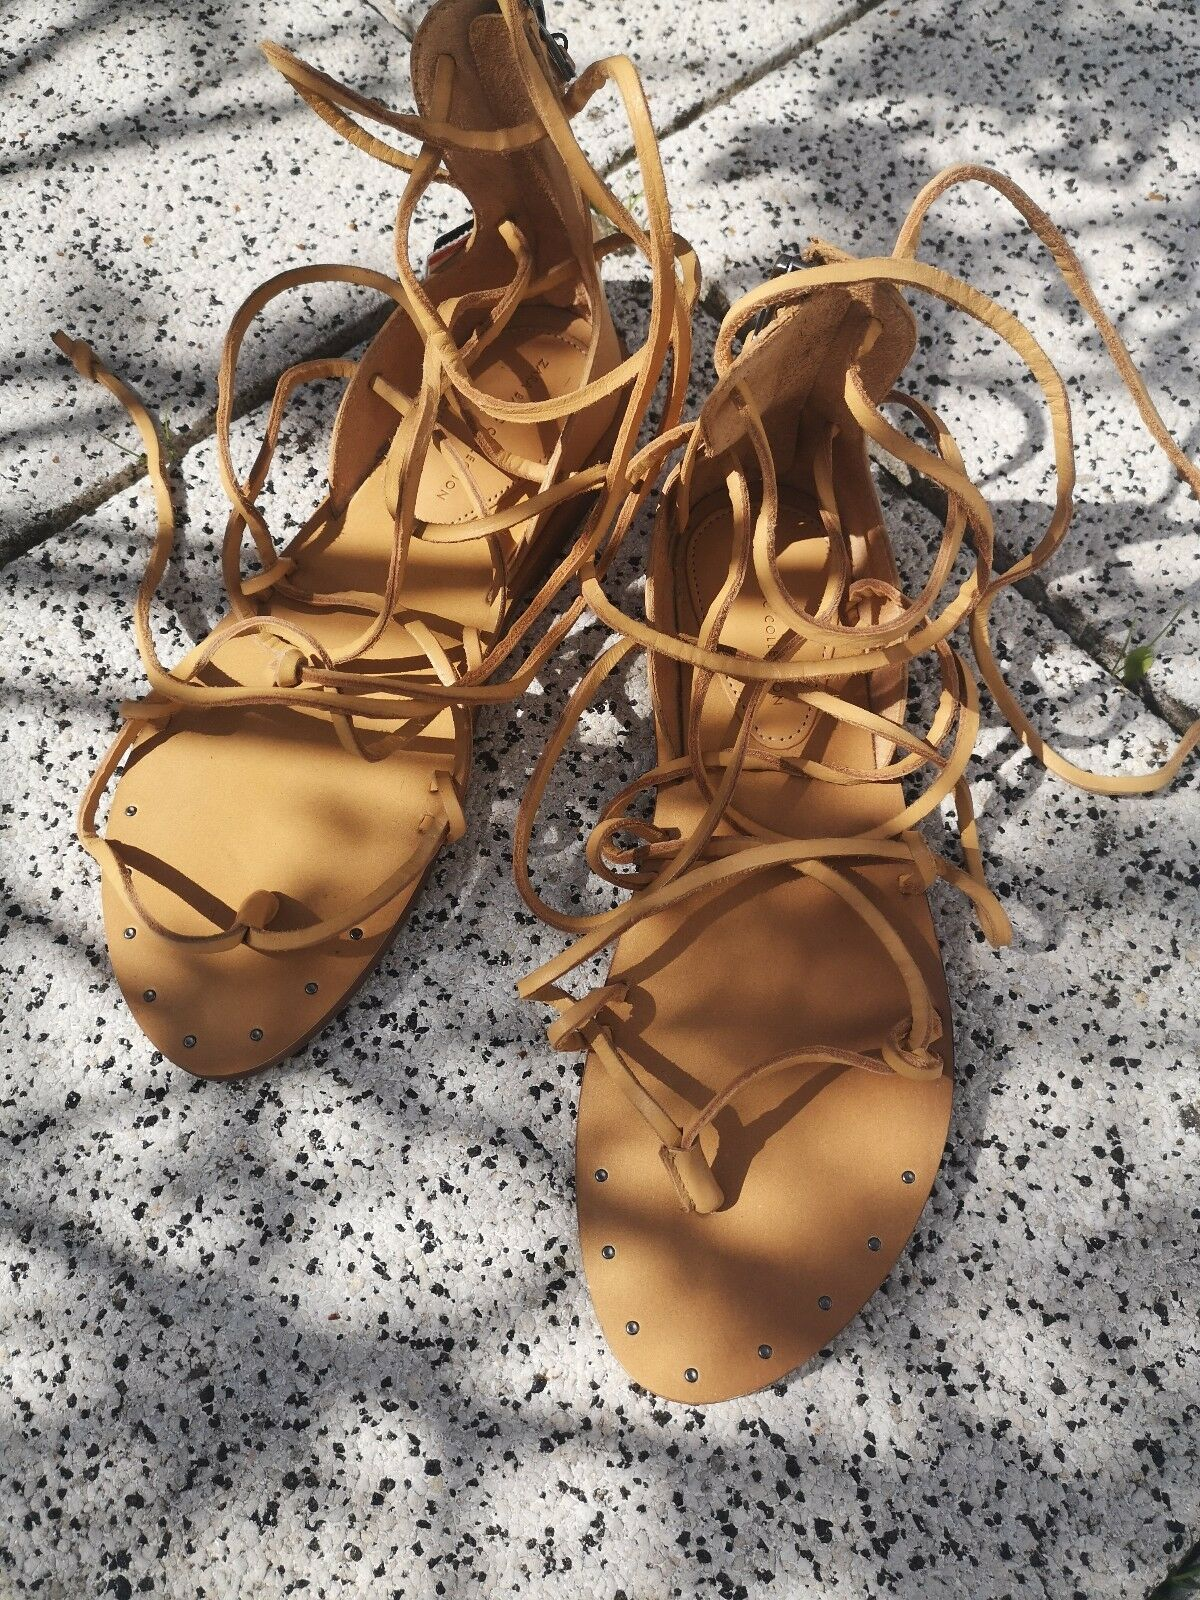 Sandale 38 zara lace up Sandalette echtes Leder Greek hippie ibiza schnüren